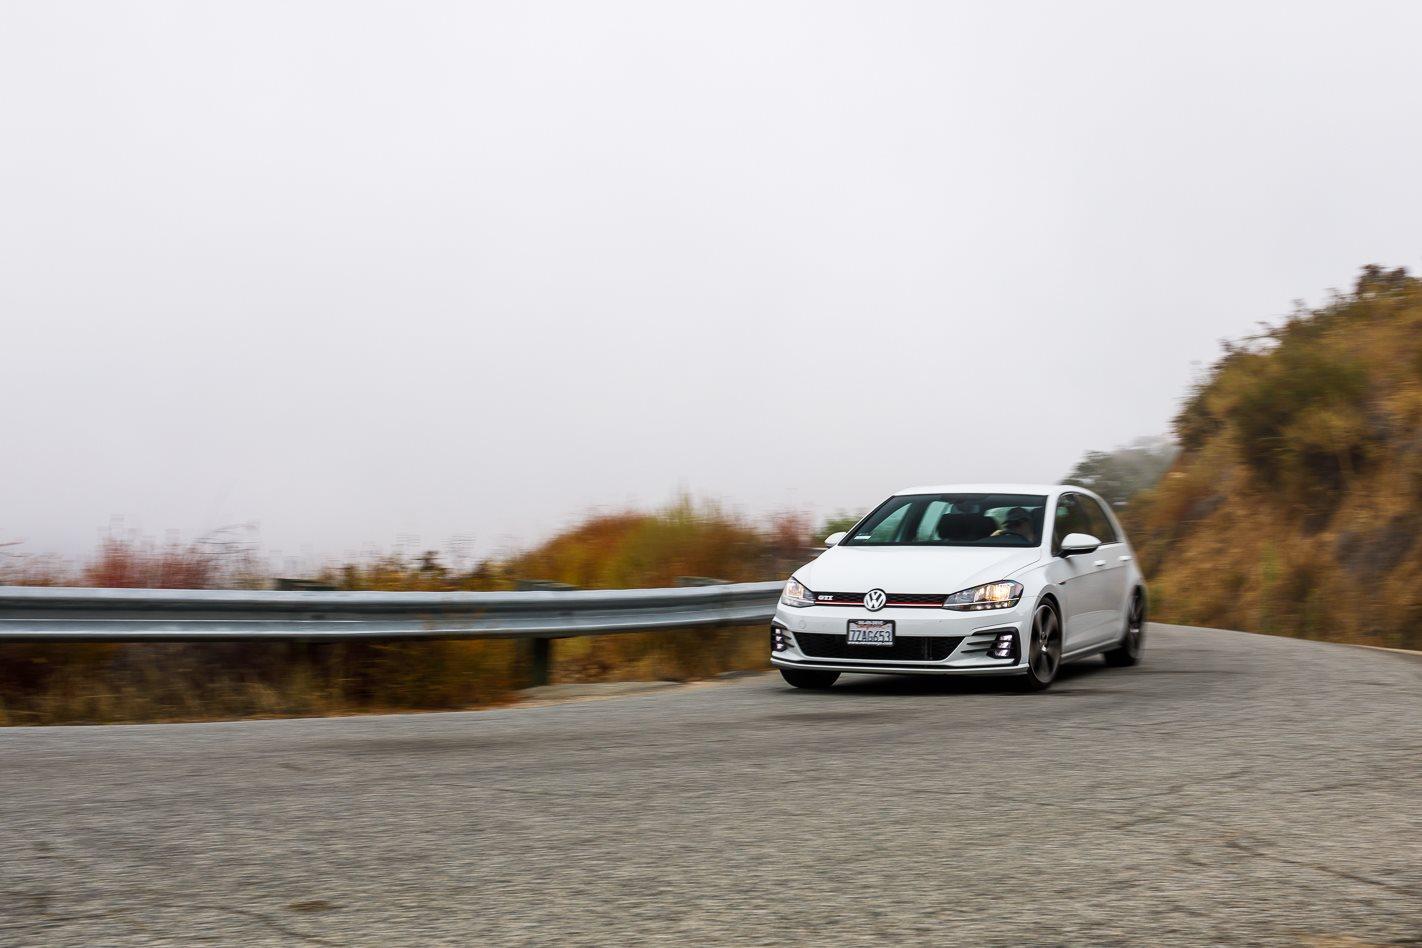 From LA to Monterey in a Volkswagen Golf GTI: Road trip